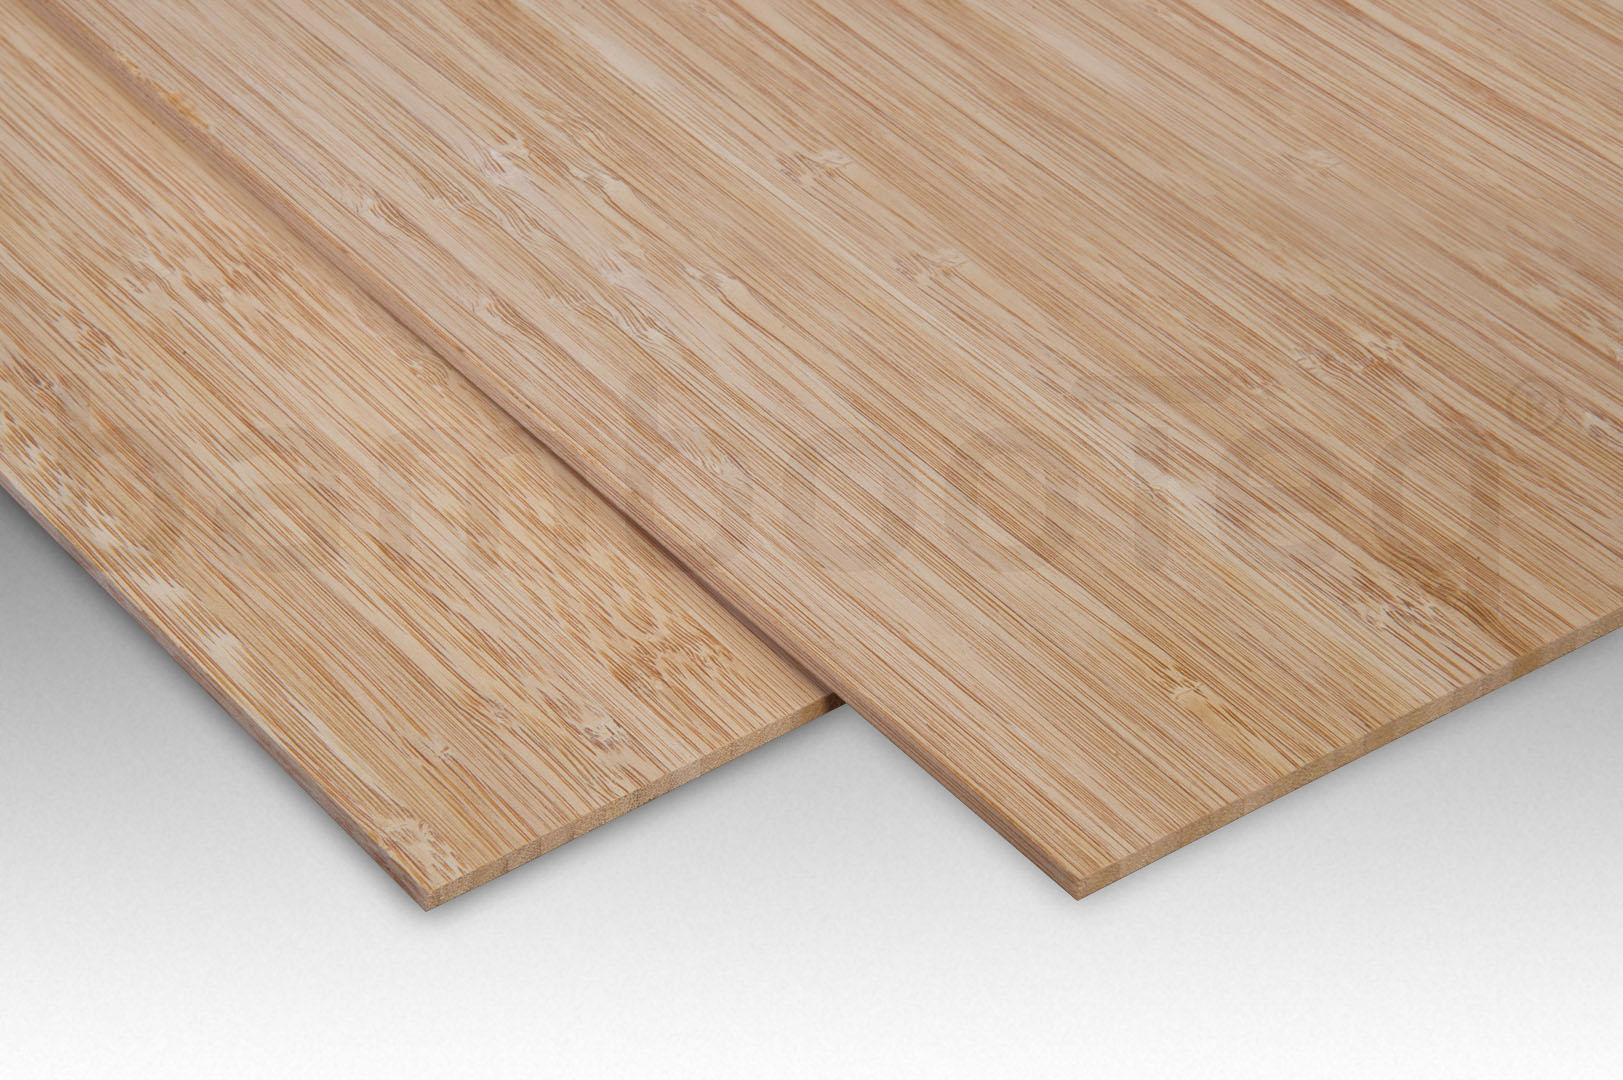 Moso Bamboe Prijzen : Bamboe plaat mm side pressed laags caramel cm